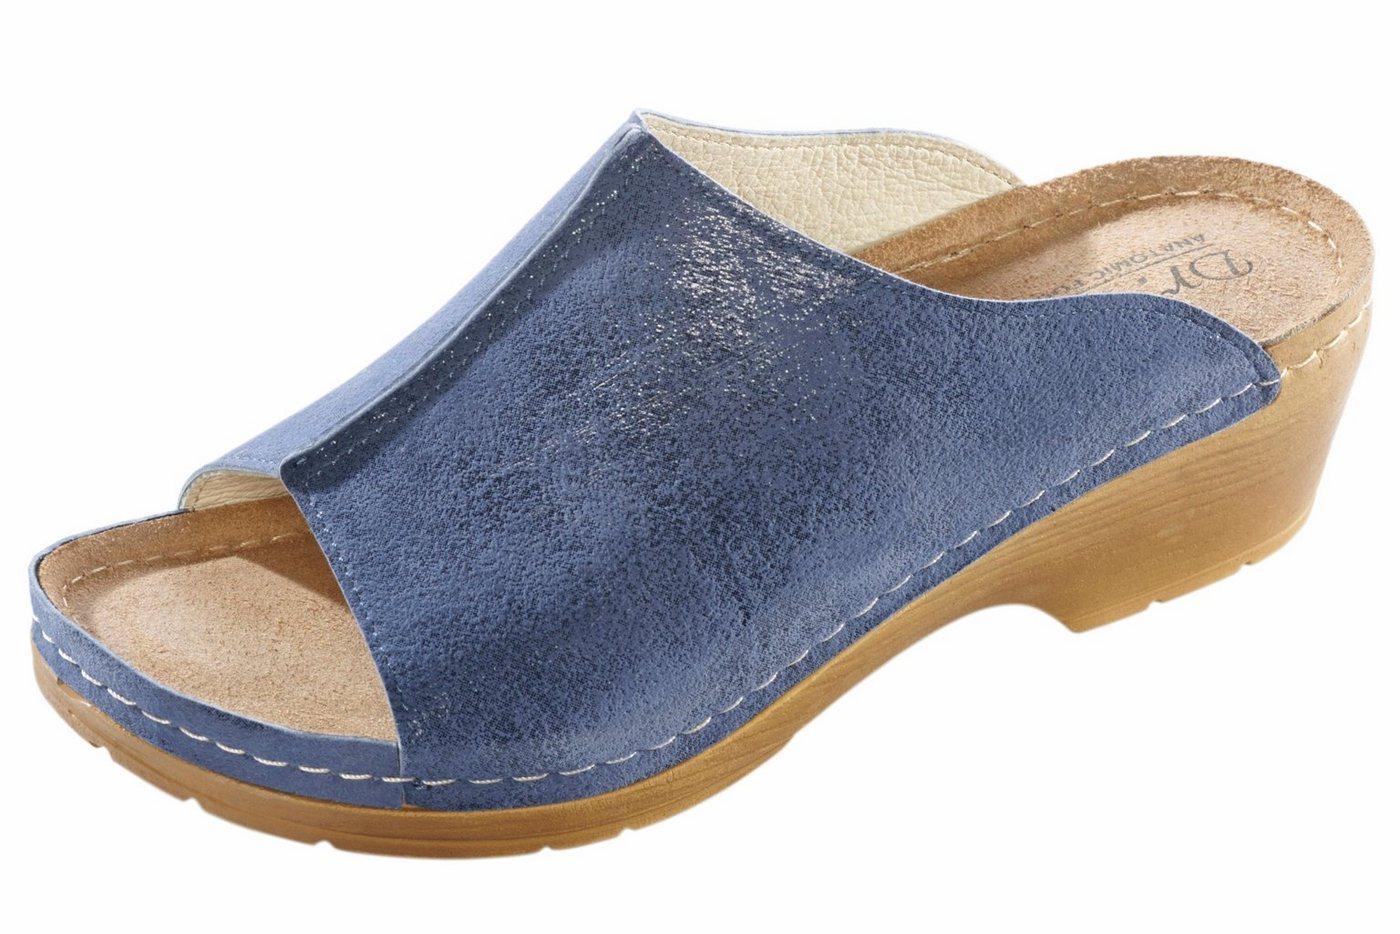 heine home Clogs mit Leder-Innensohle | Schuhe > Clogs & Pantoletten > Clogs | Blau | heine home